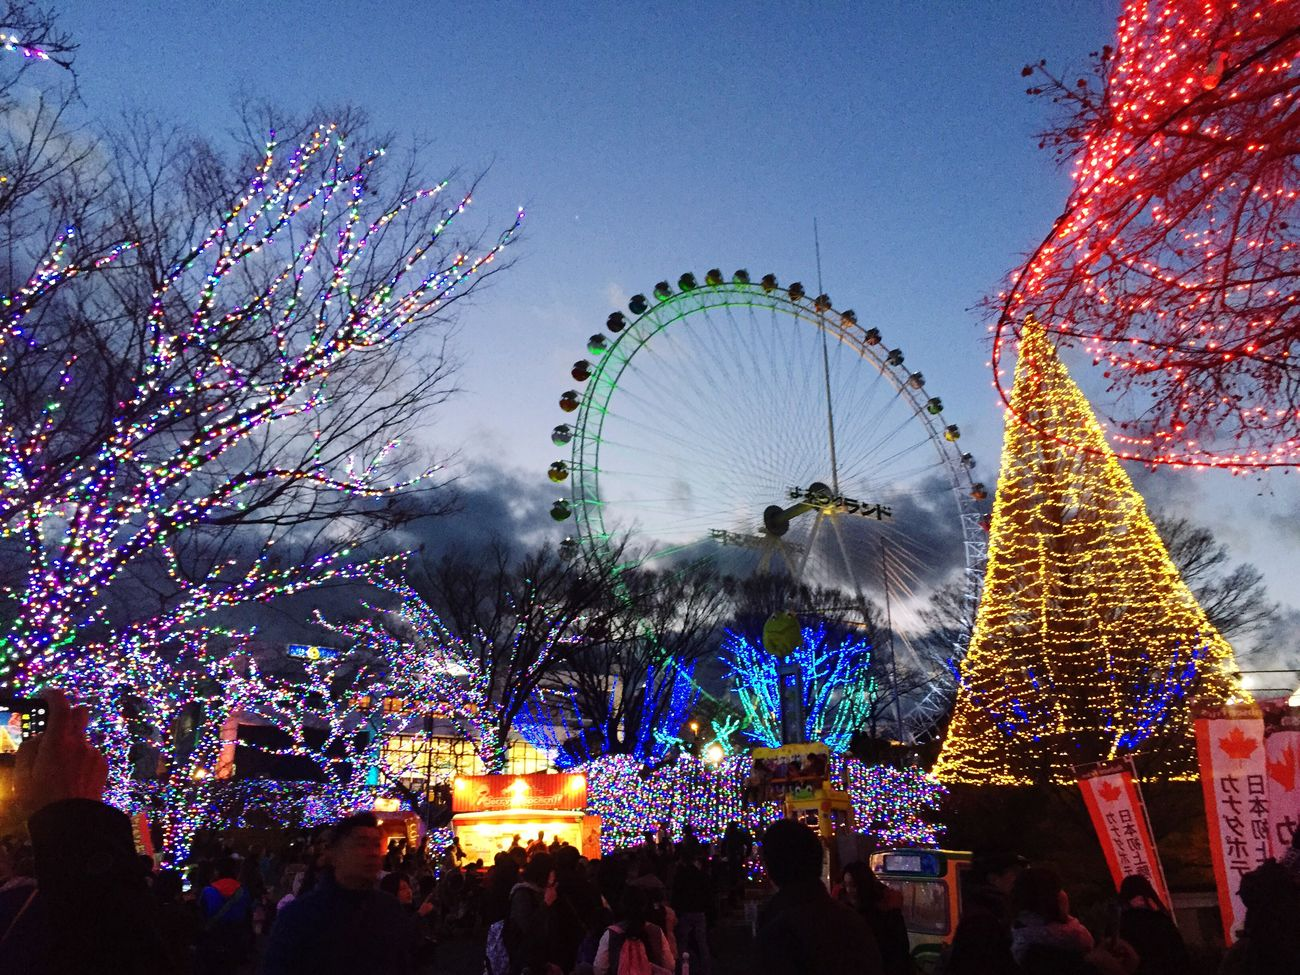 Christmas Illumination Amusementpark Japan Light Ferris Wheel クリスマス イルミネーション 遊園地 観覧車 よみうりランド